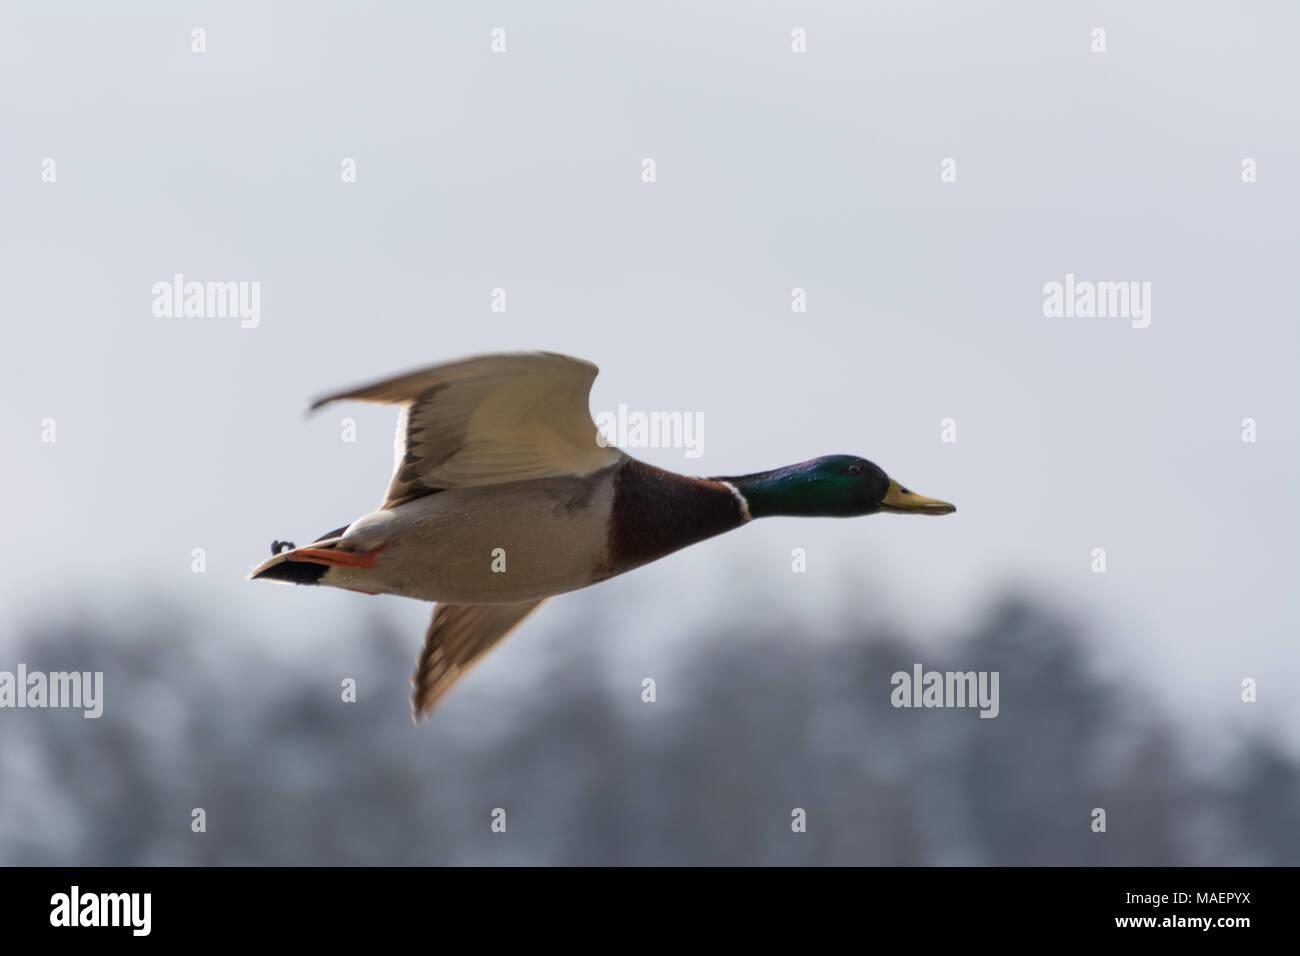 Flying mallard duck in the sky - Stock Image